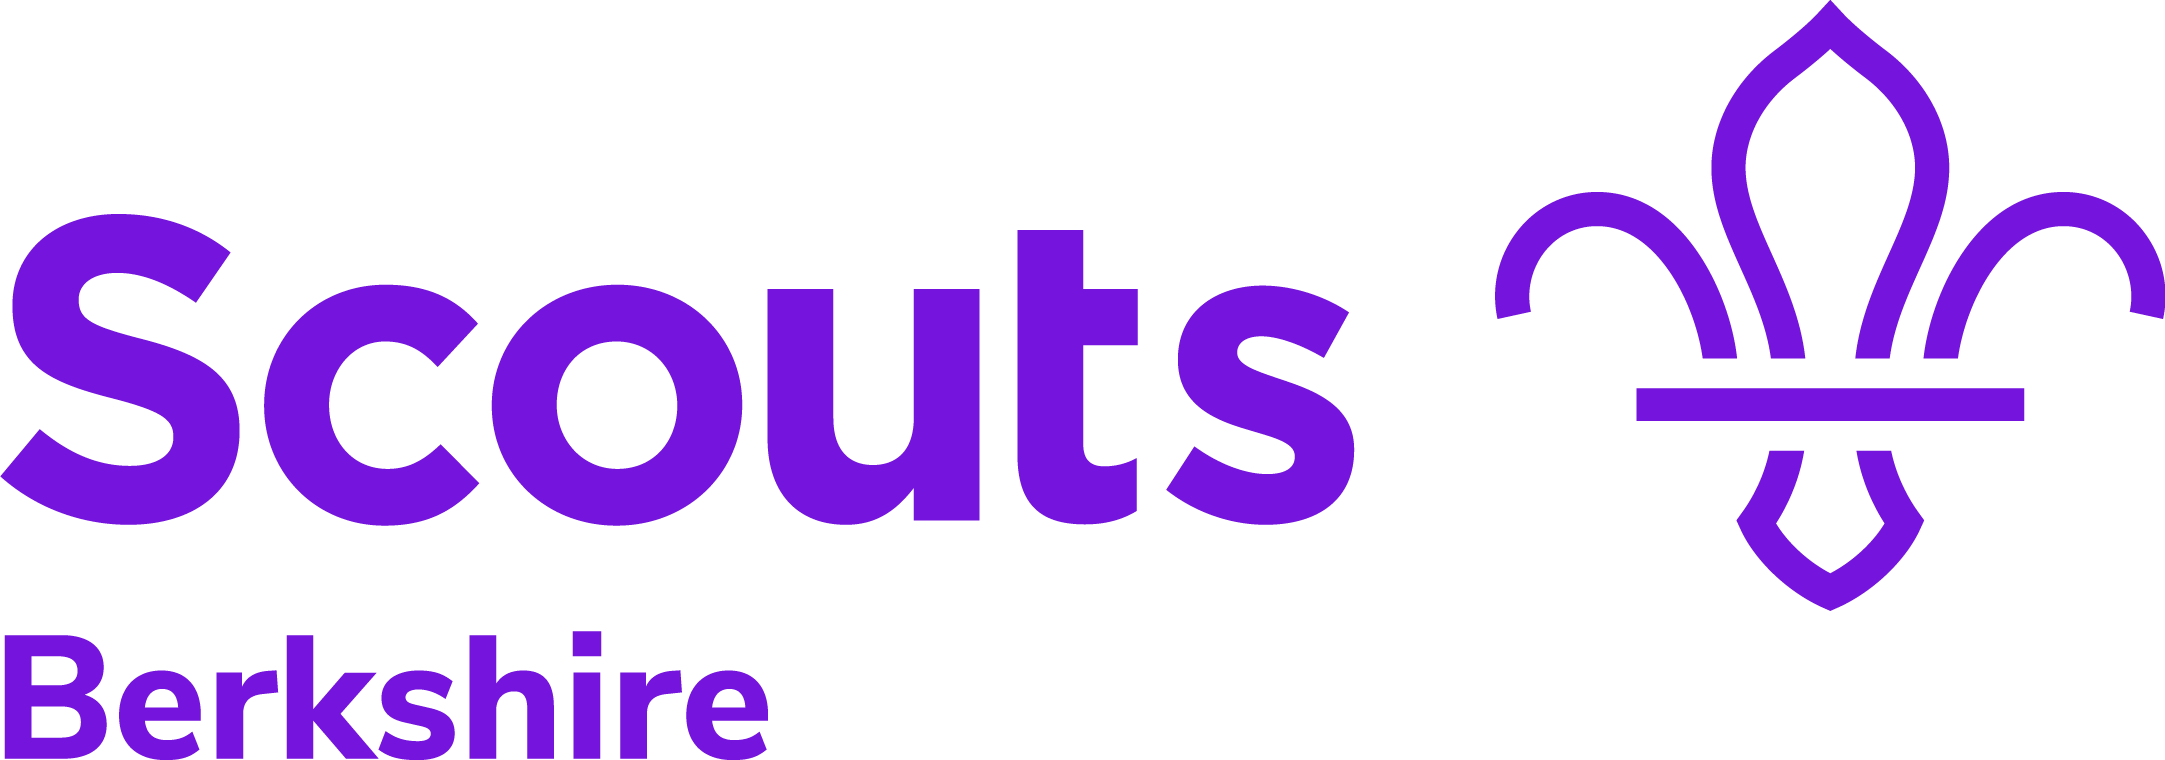 Berkshire Scouts Logo